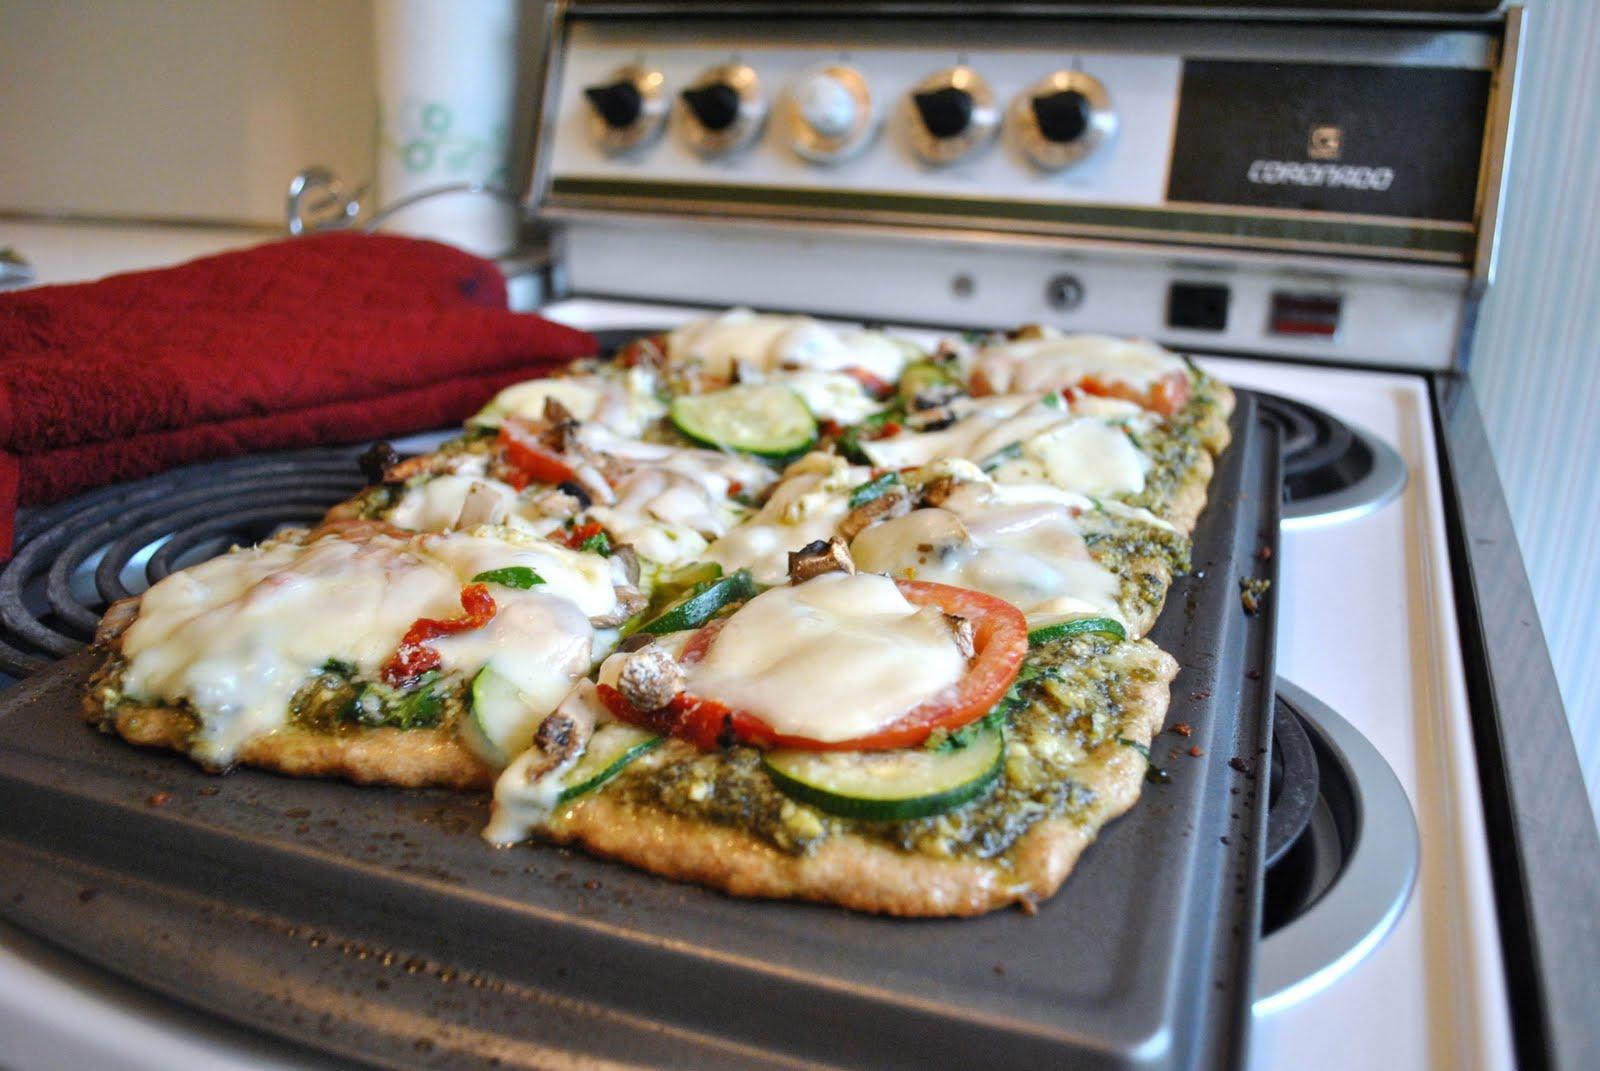 Kristin in Her Kitchen: Zucchini Pesto Pizza